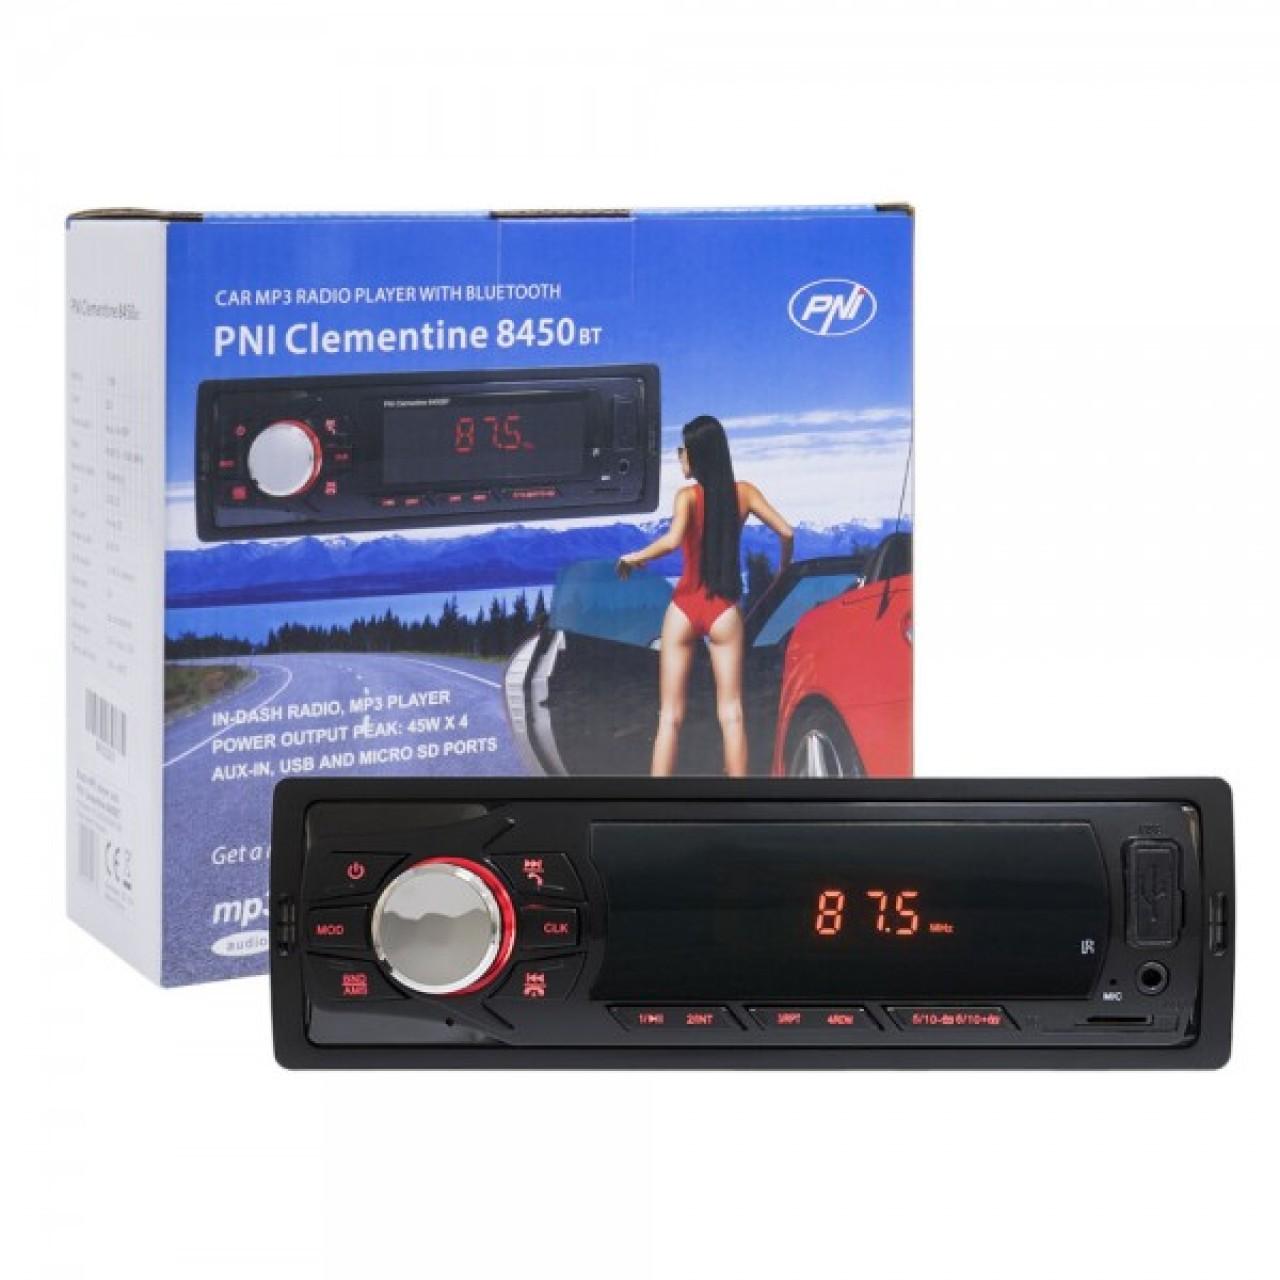 Radio MP3 player auto PNI Clementine 8450BT 4x45w 1 DIN cu SD, USB, AUX, RCA si Bluetooth